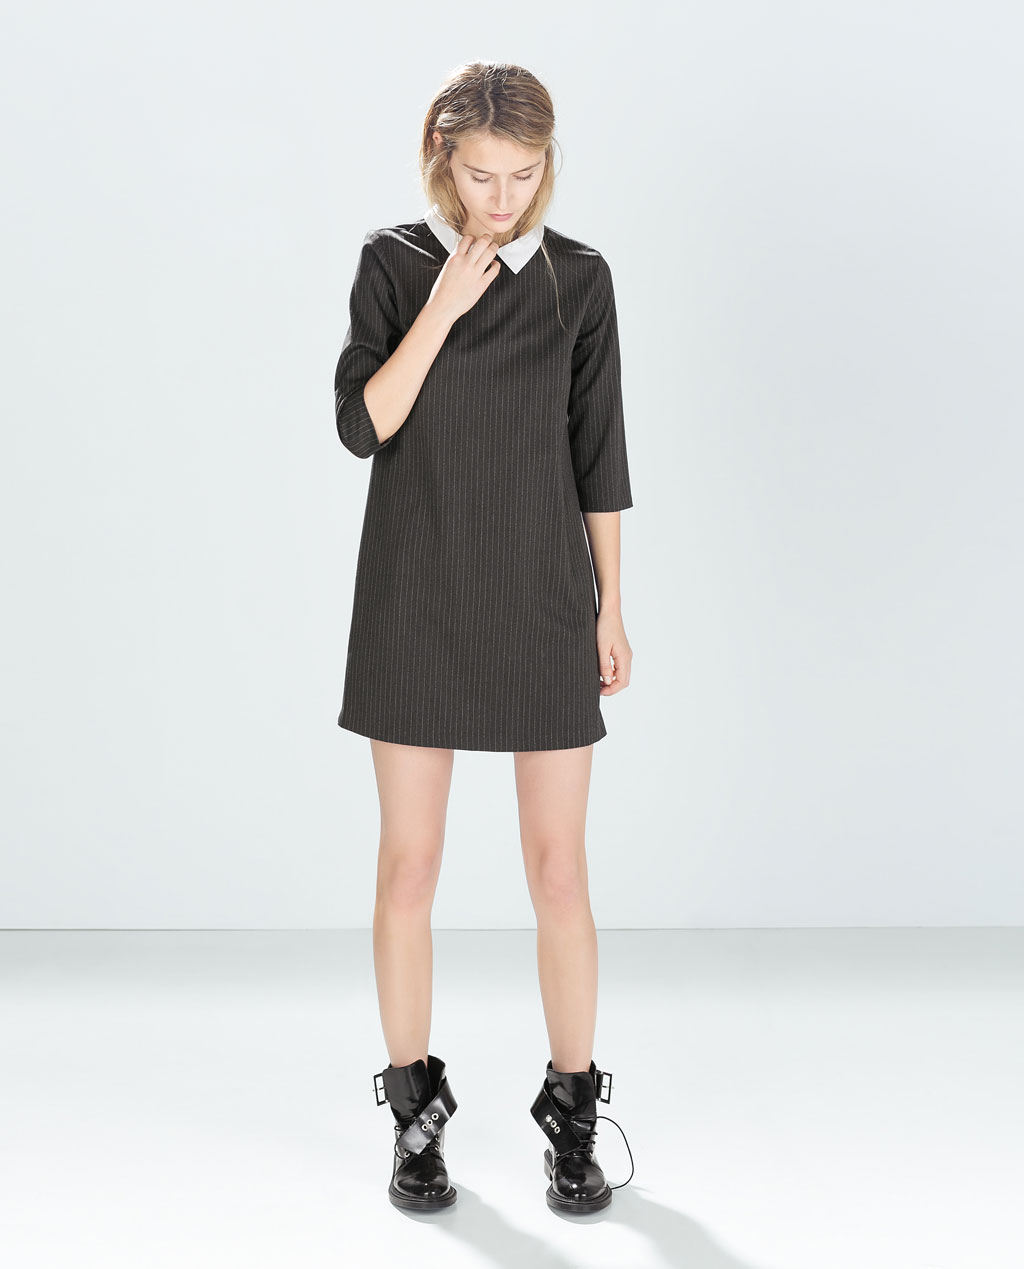 Zara Pinstripe Dress